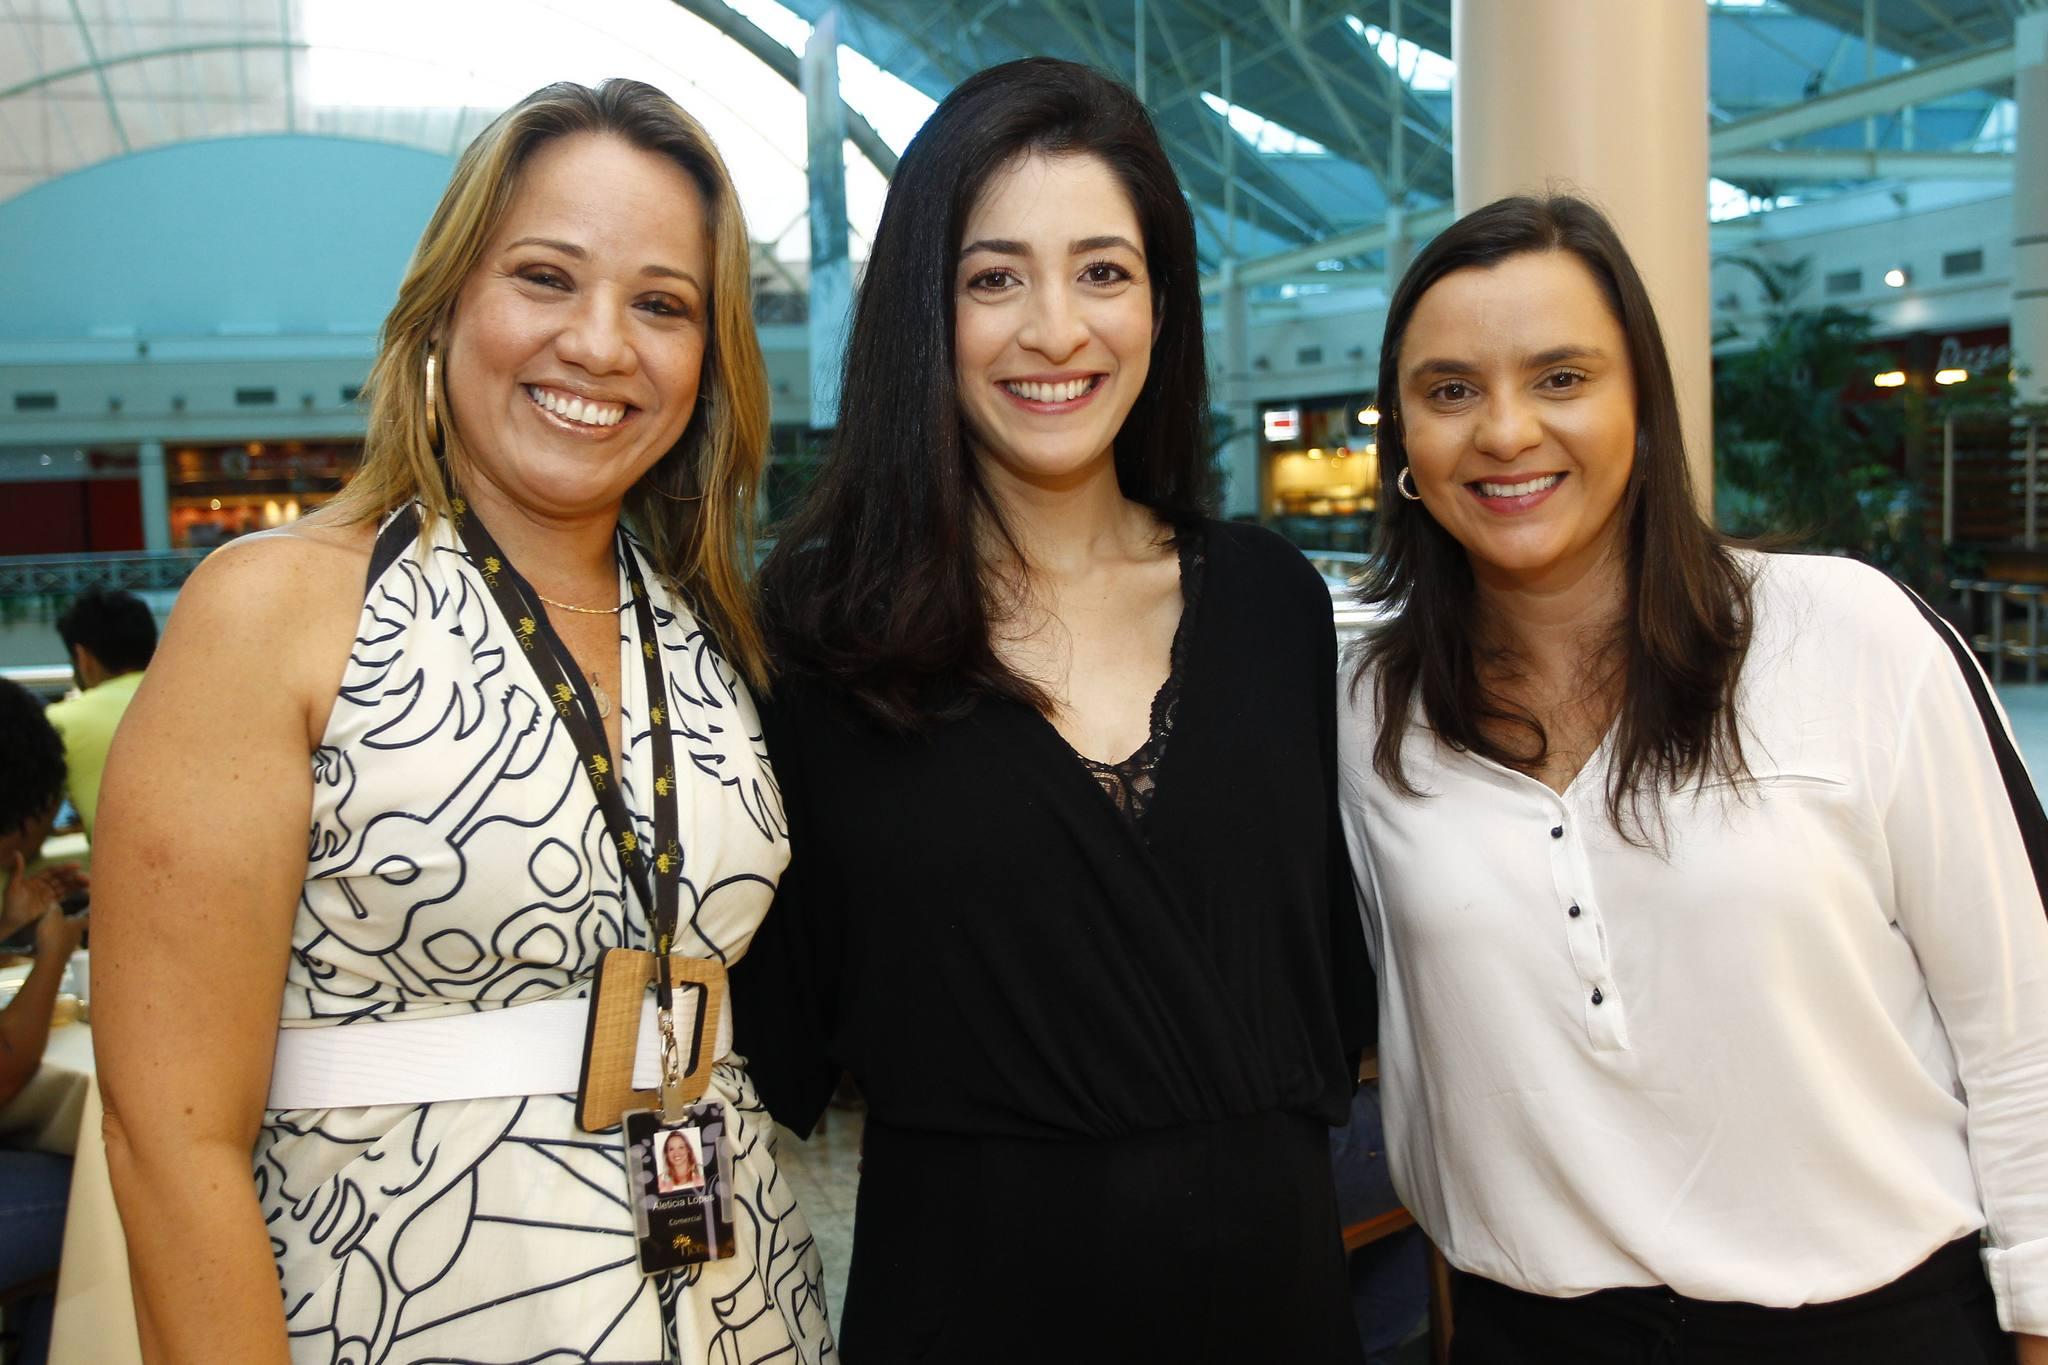 Aleticia Pessoa, Mila Brasil E Natalia Pinheiro